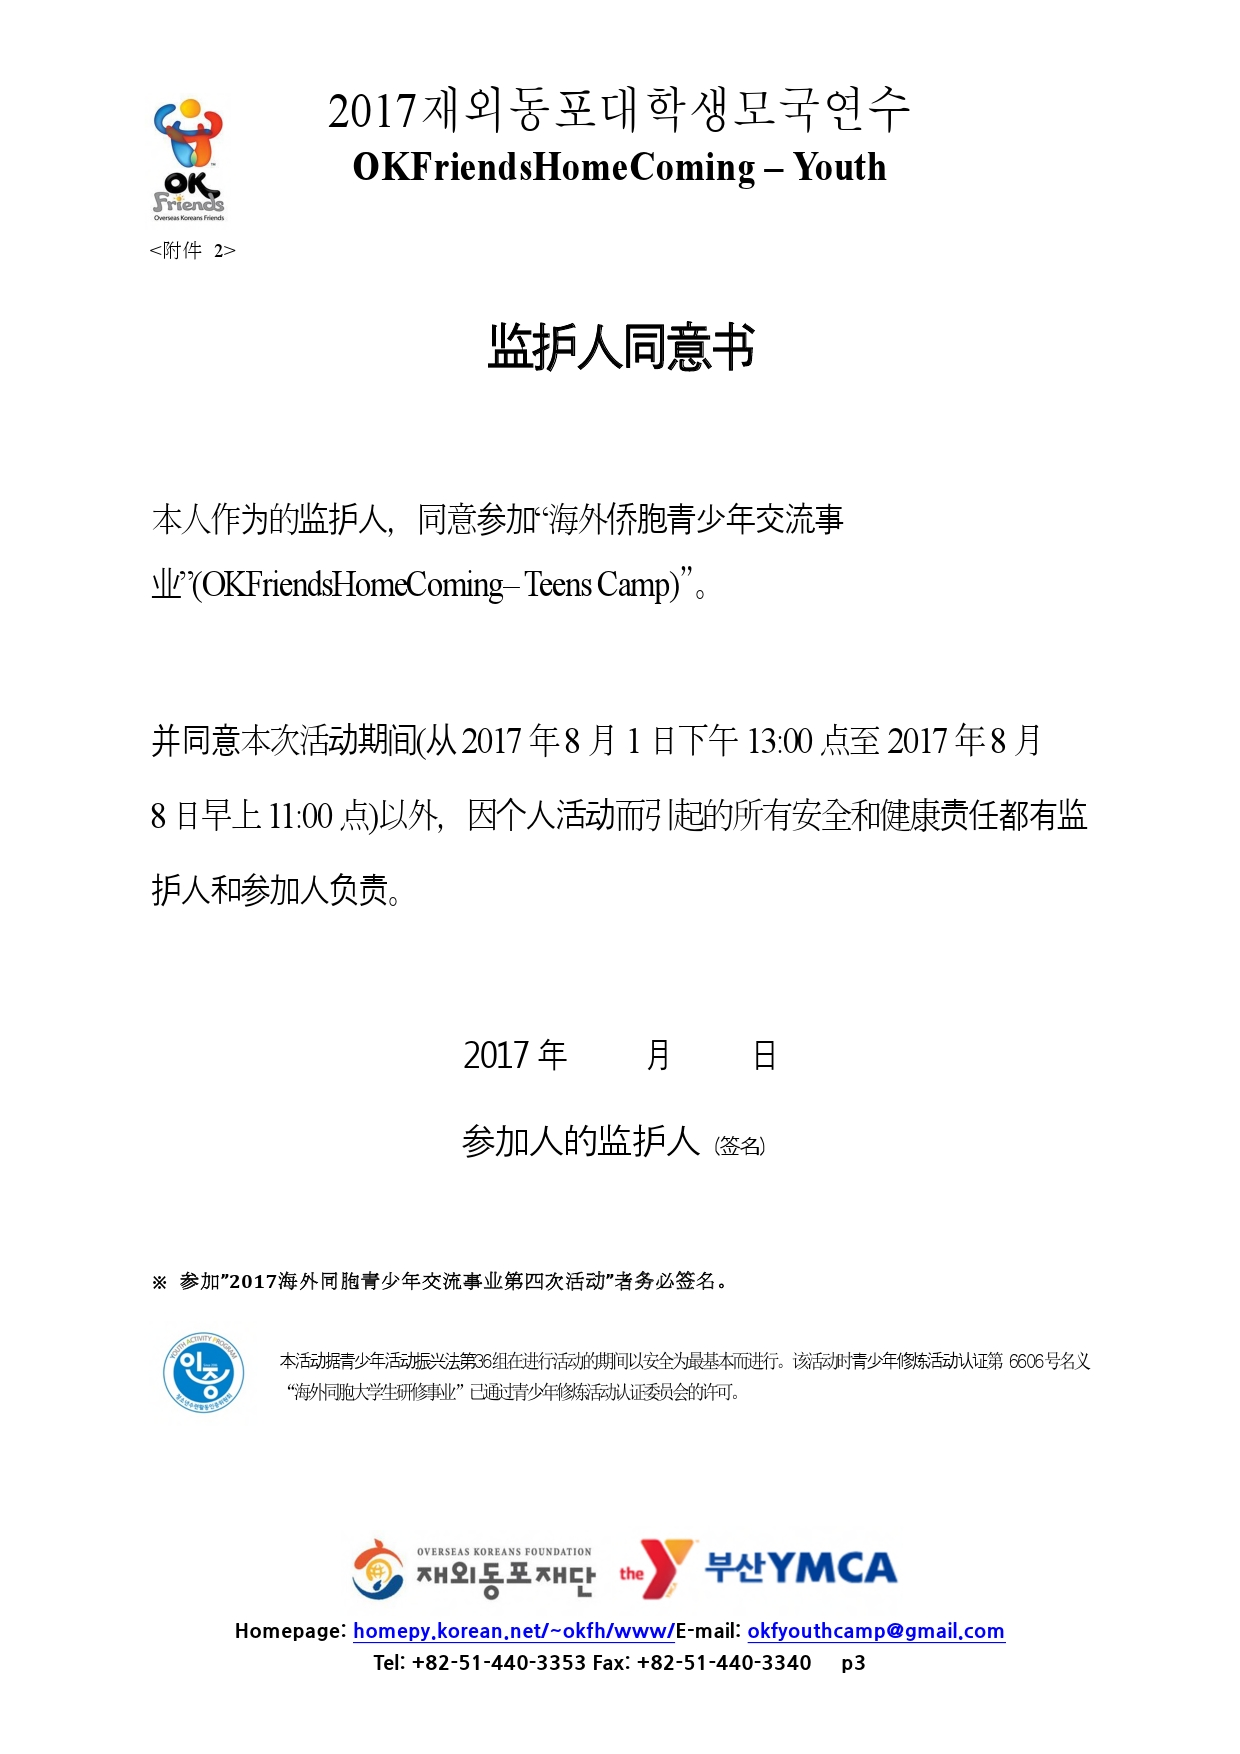 2017_OKF_YOUTH_INFO_1_CHN_2-3.jpg